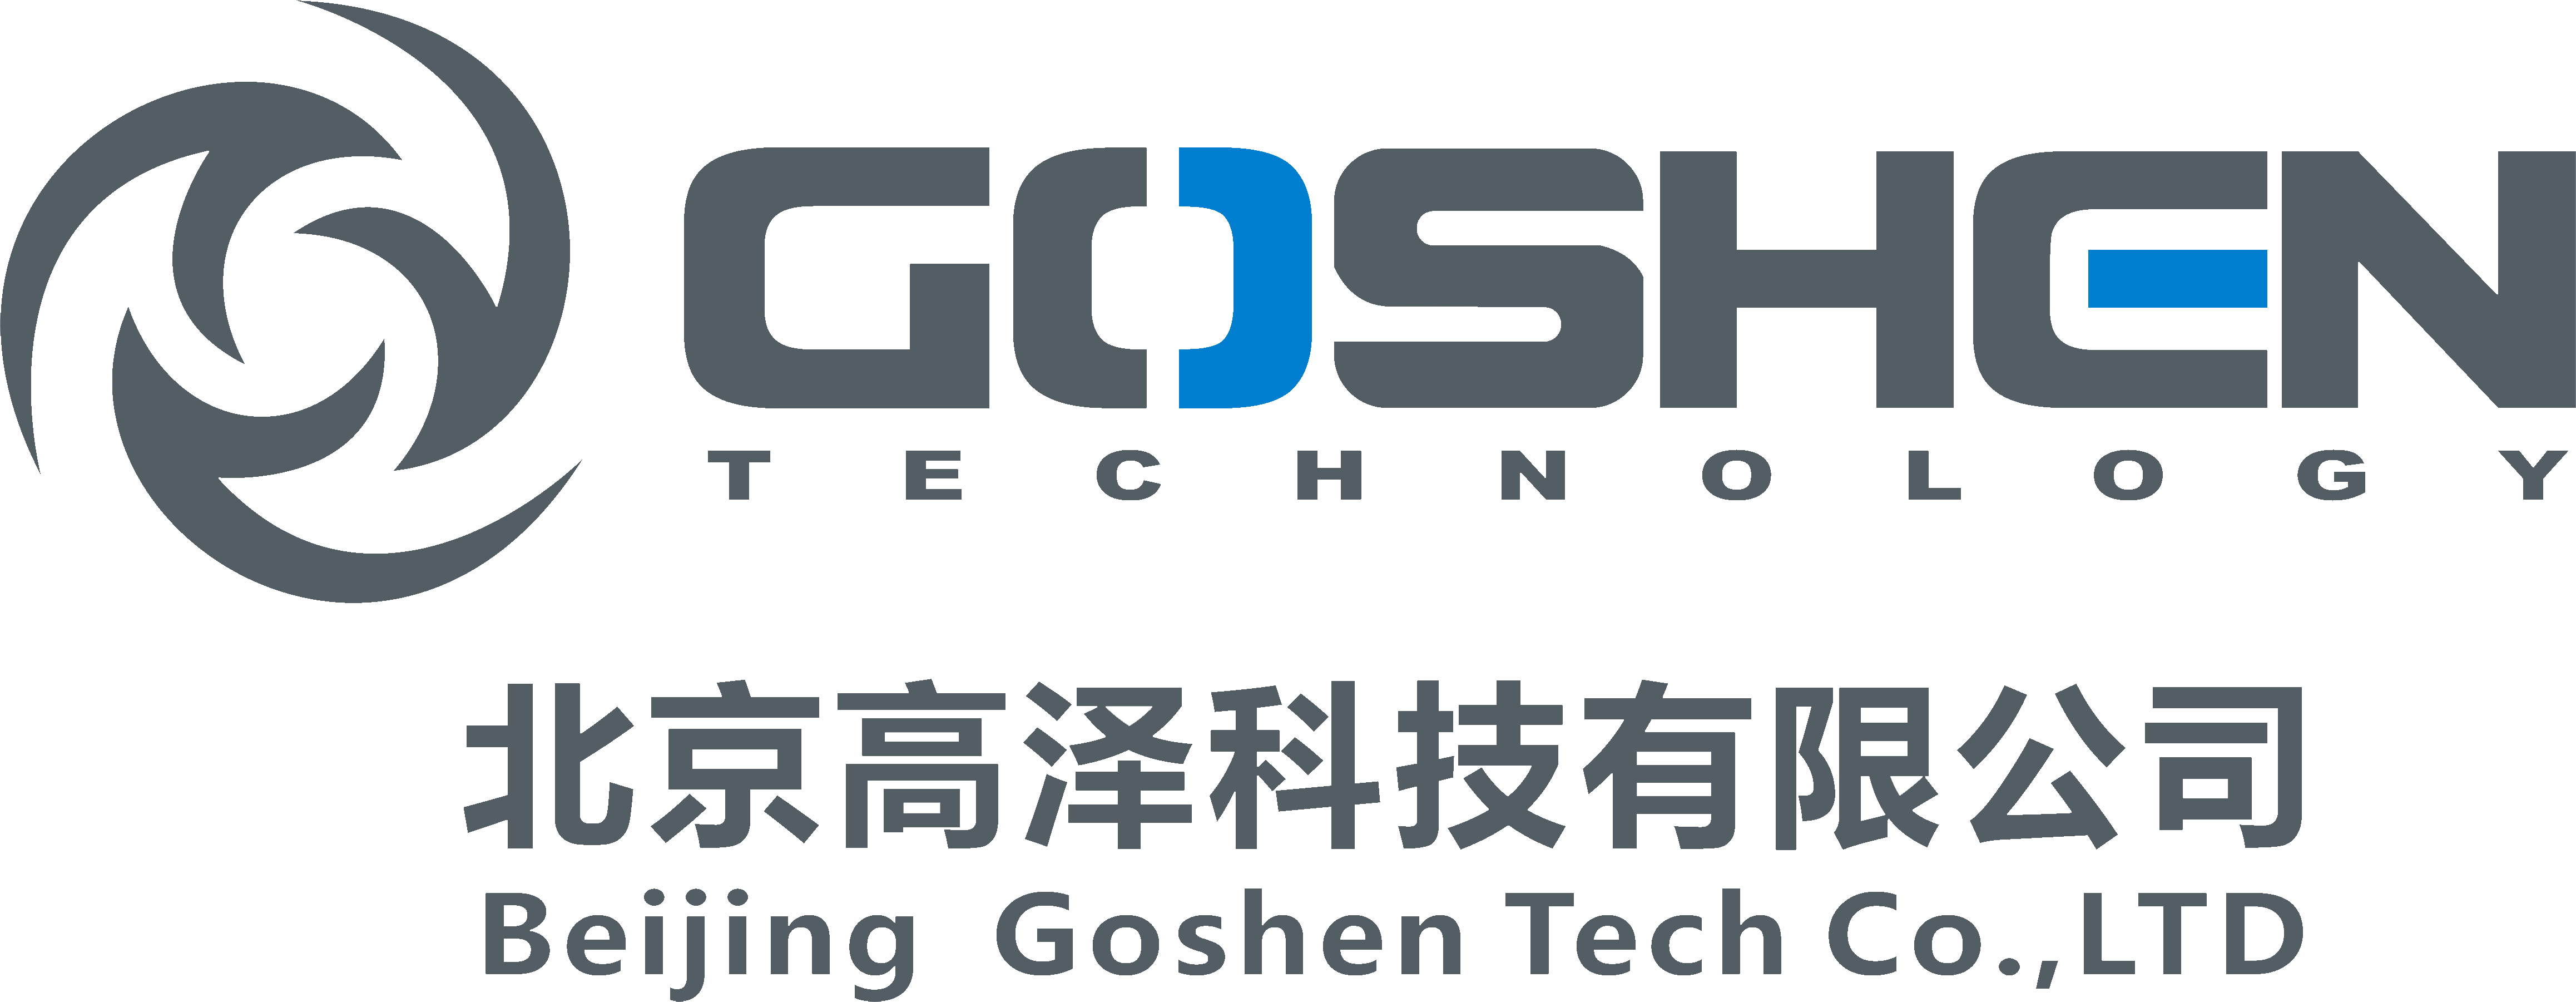 www.gostech.cn